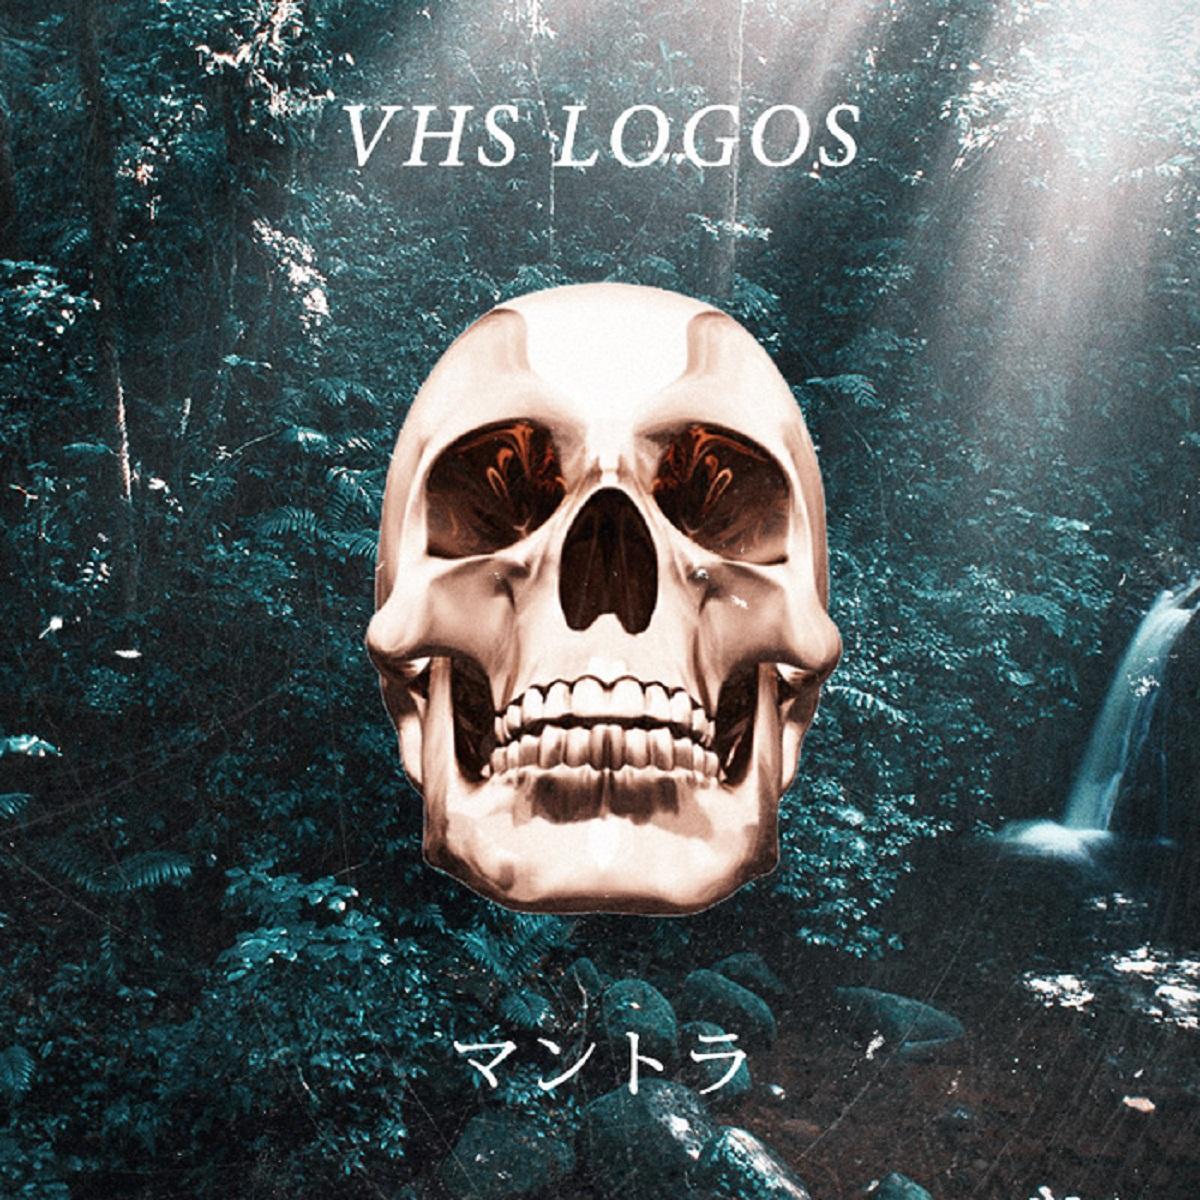 vhs logos mantra cover